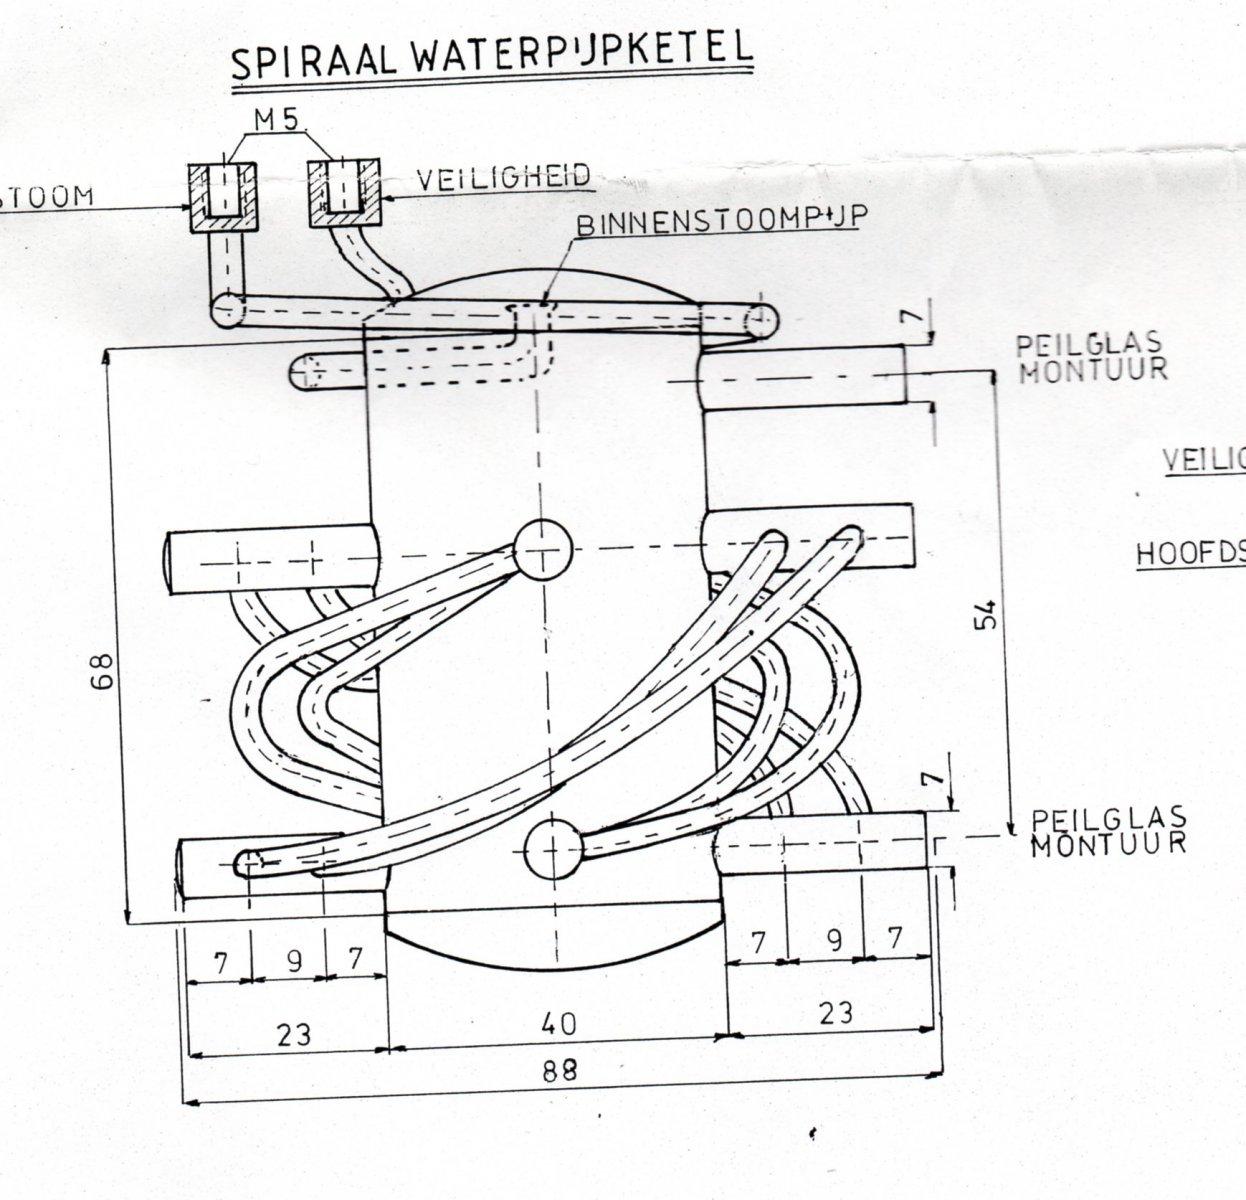 Spiraal waterpijpketel.jpg